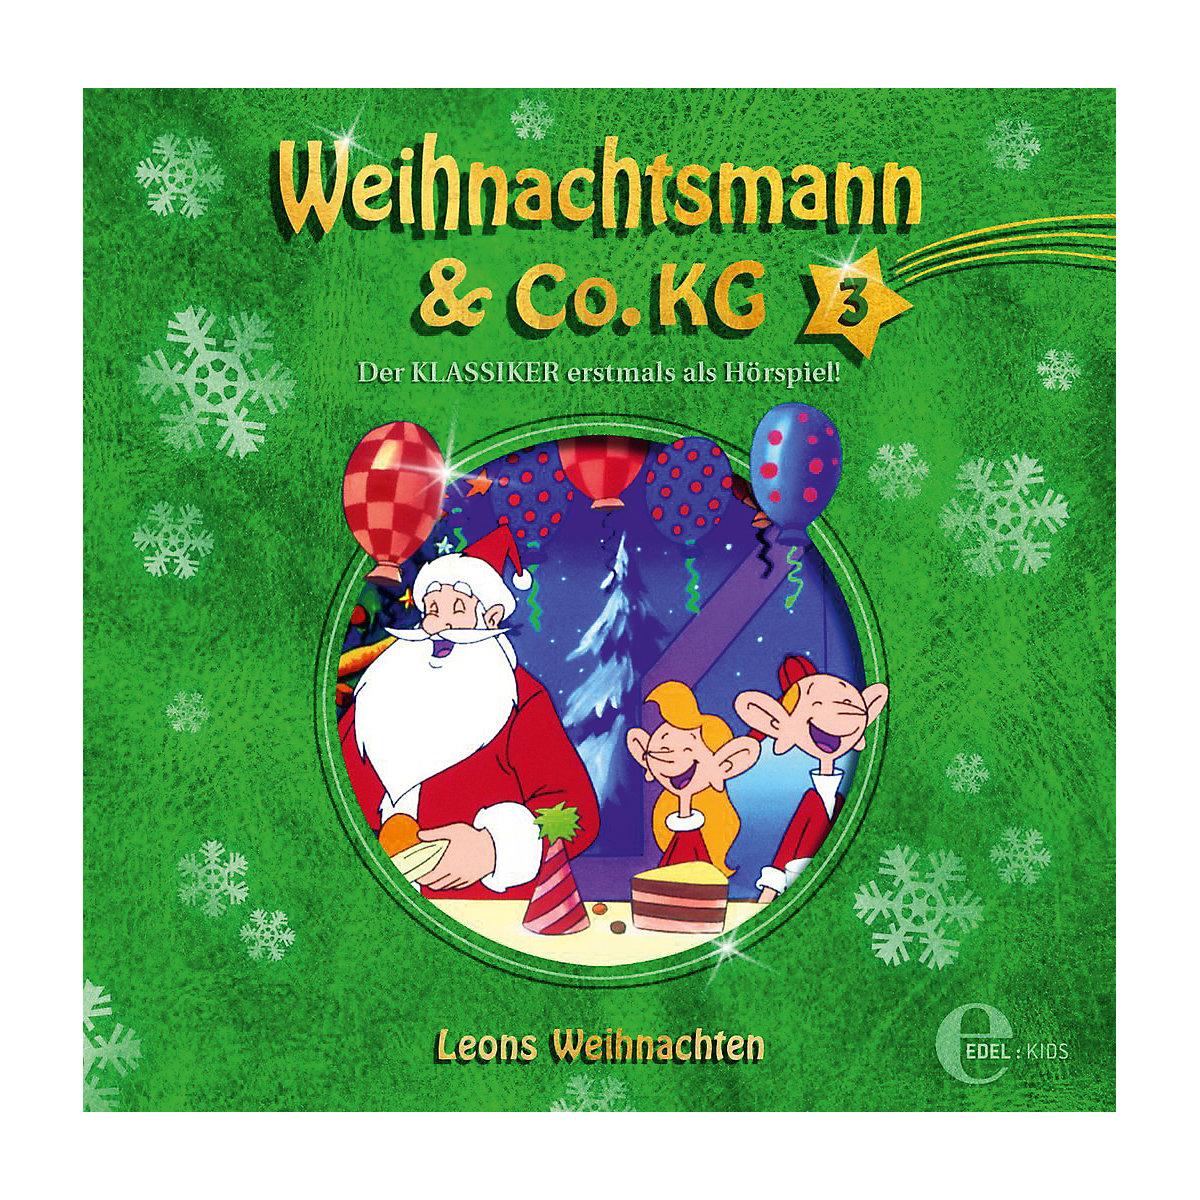 cd weihnachtsmann co kg 3 leons weihnachten edel mytoys. Black Bedroom Furniture Sets. Home Design Ideas